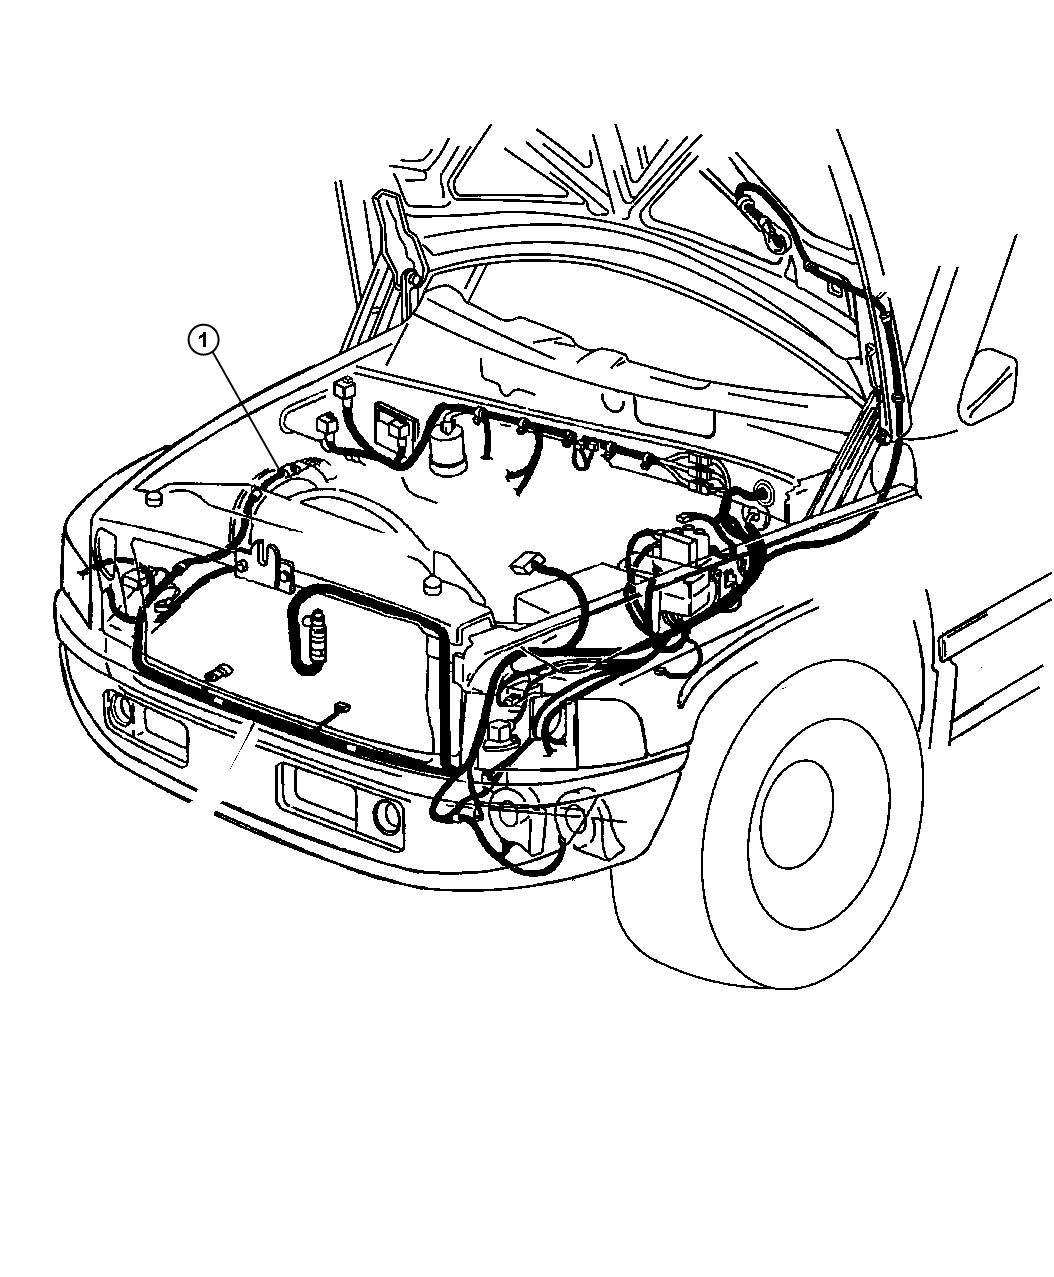 Dodge Truck Wiring Diagram Further 2005 Dodge Ram Fan Clutch Wiring